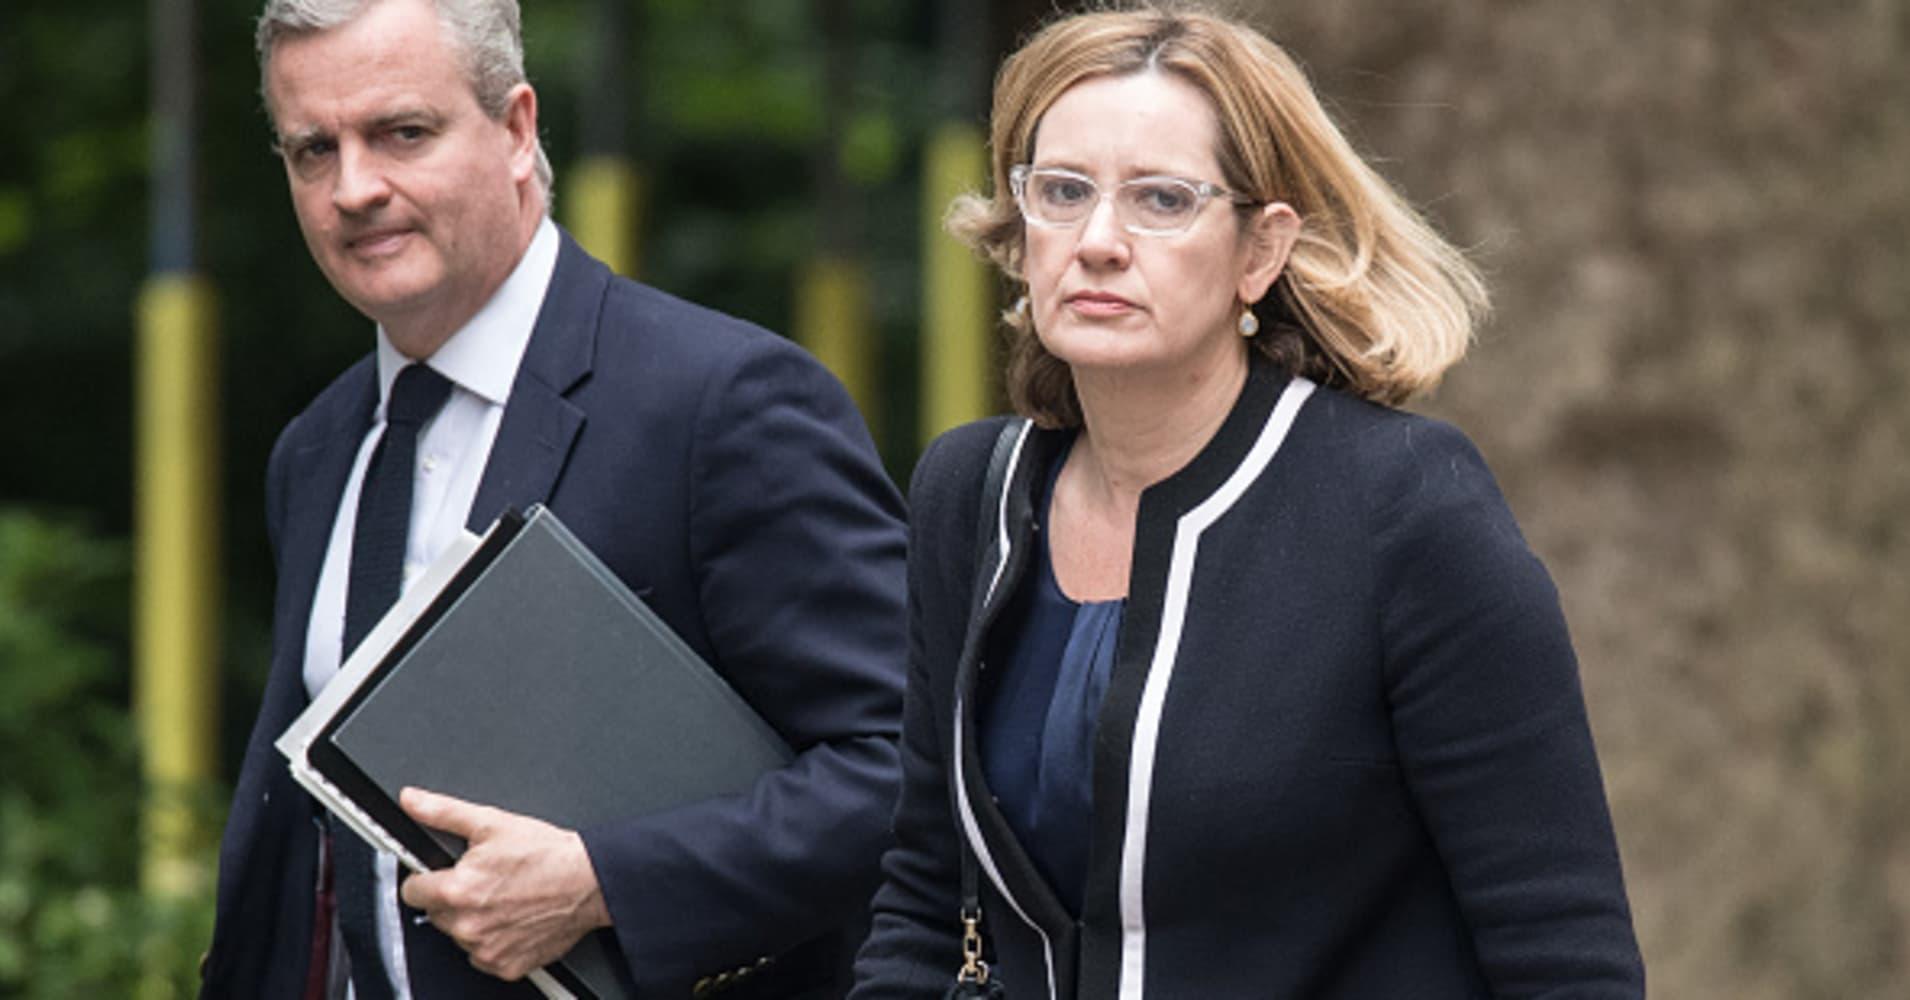 UK scolds US 'friends' for leak of Manchester bomb intelligence